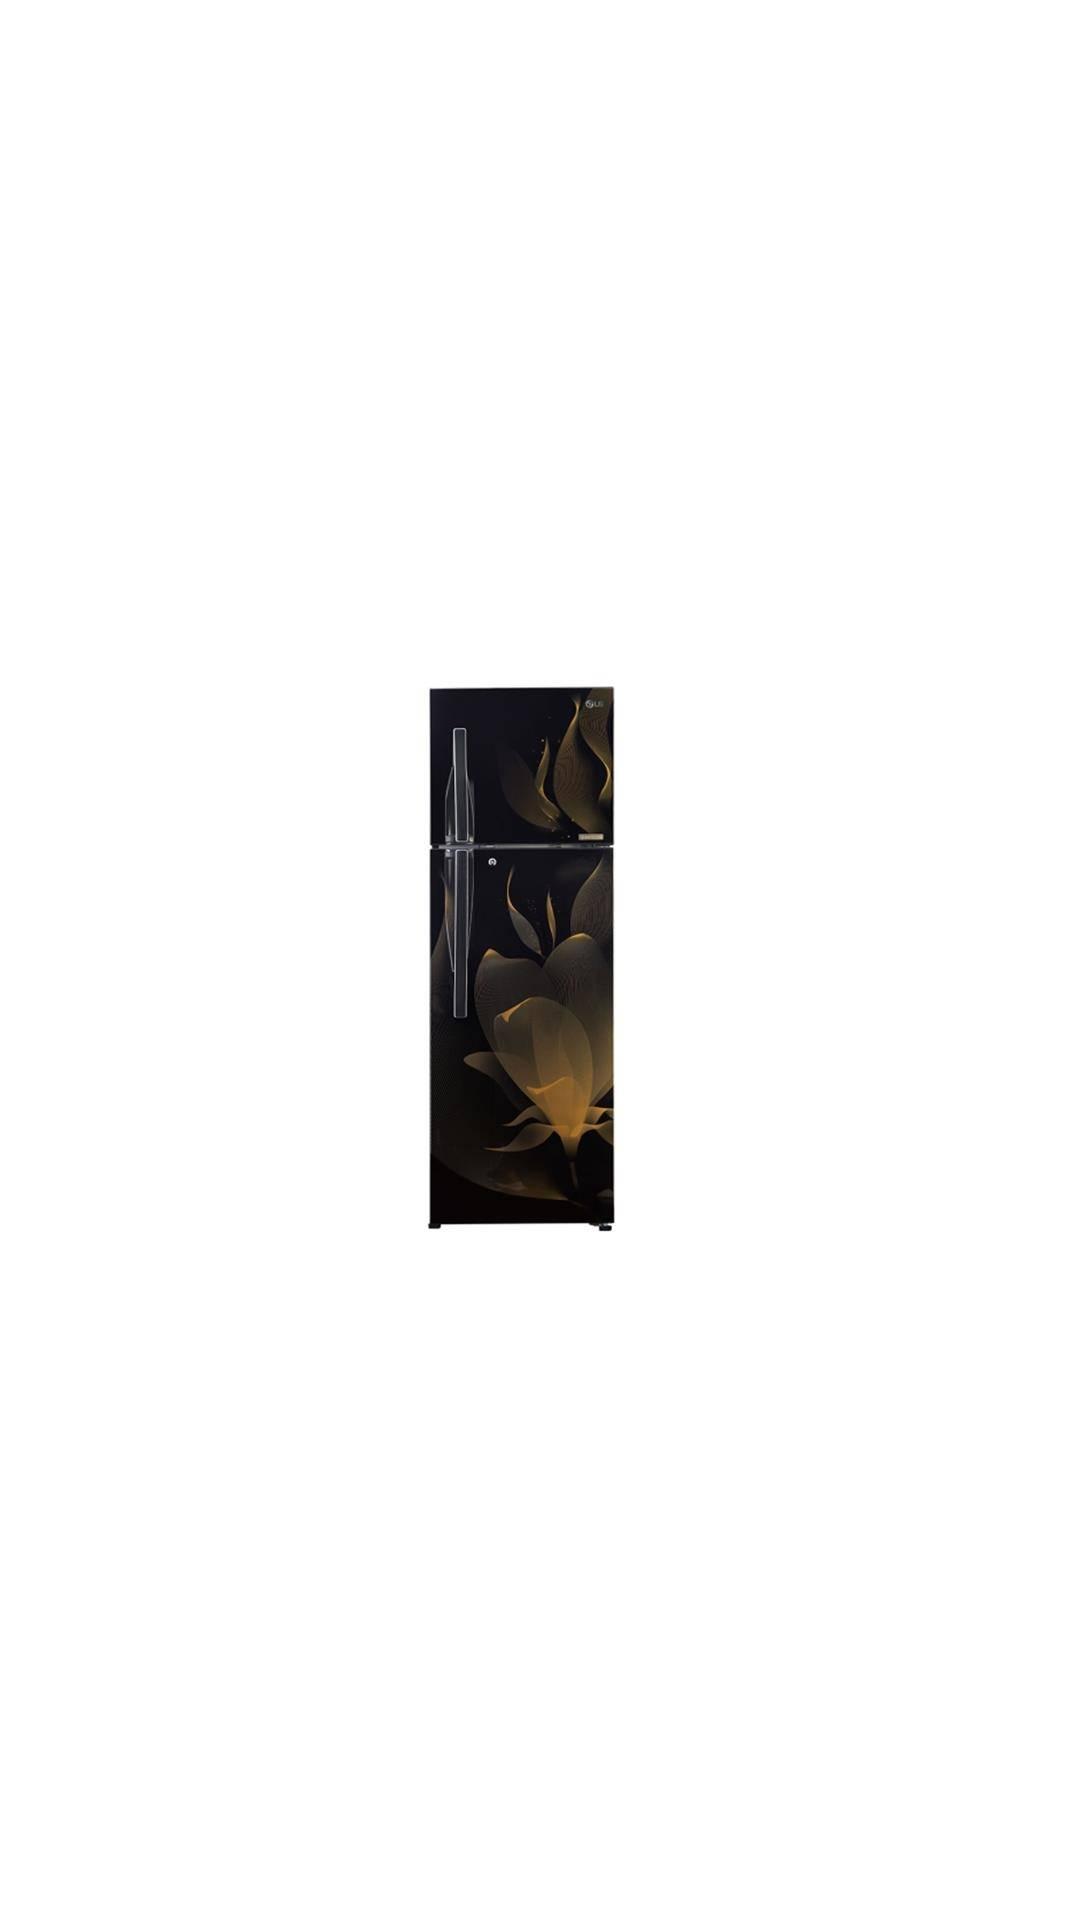 LG GL-T372RTMN 4 Star 335L Inverter Double Door Refrigerator (Twilight Magic)